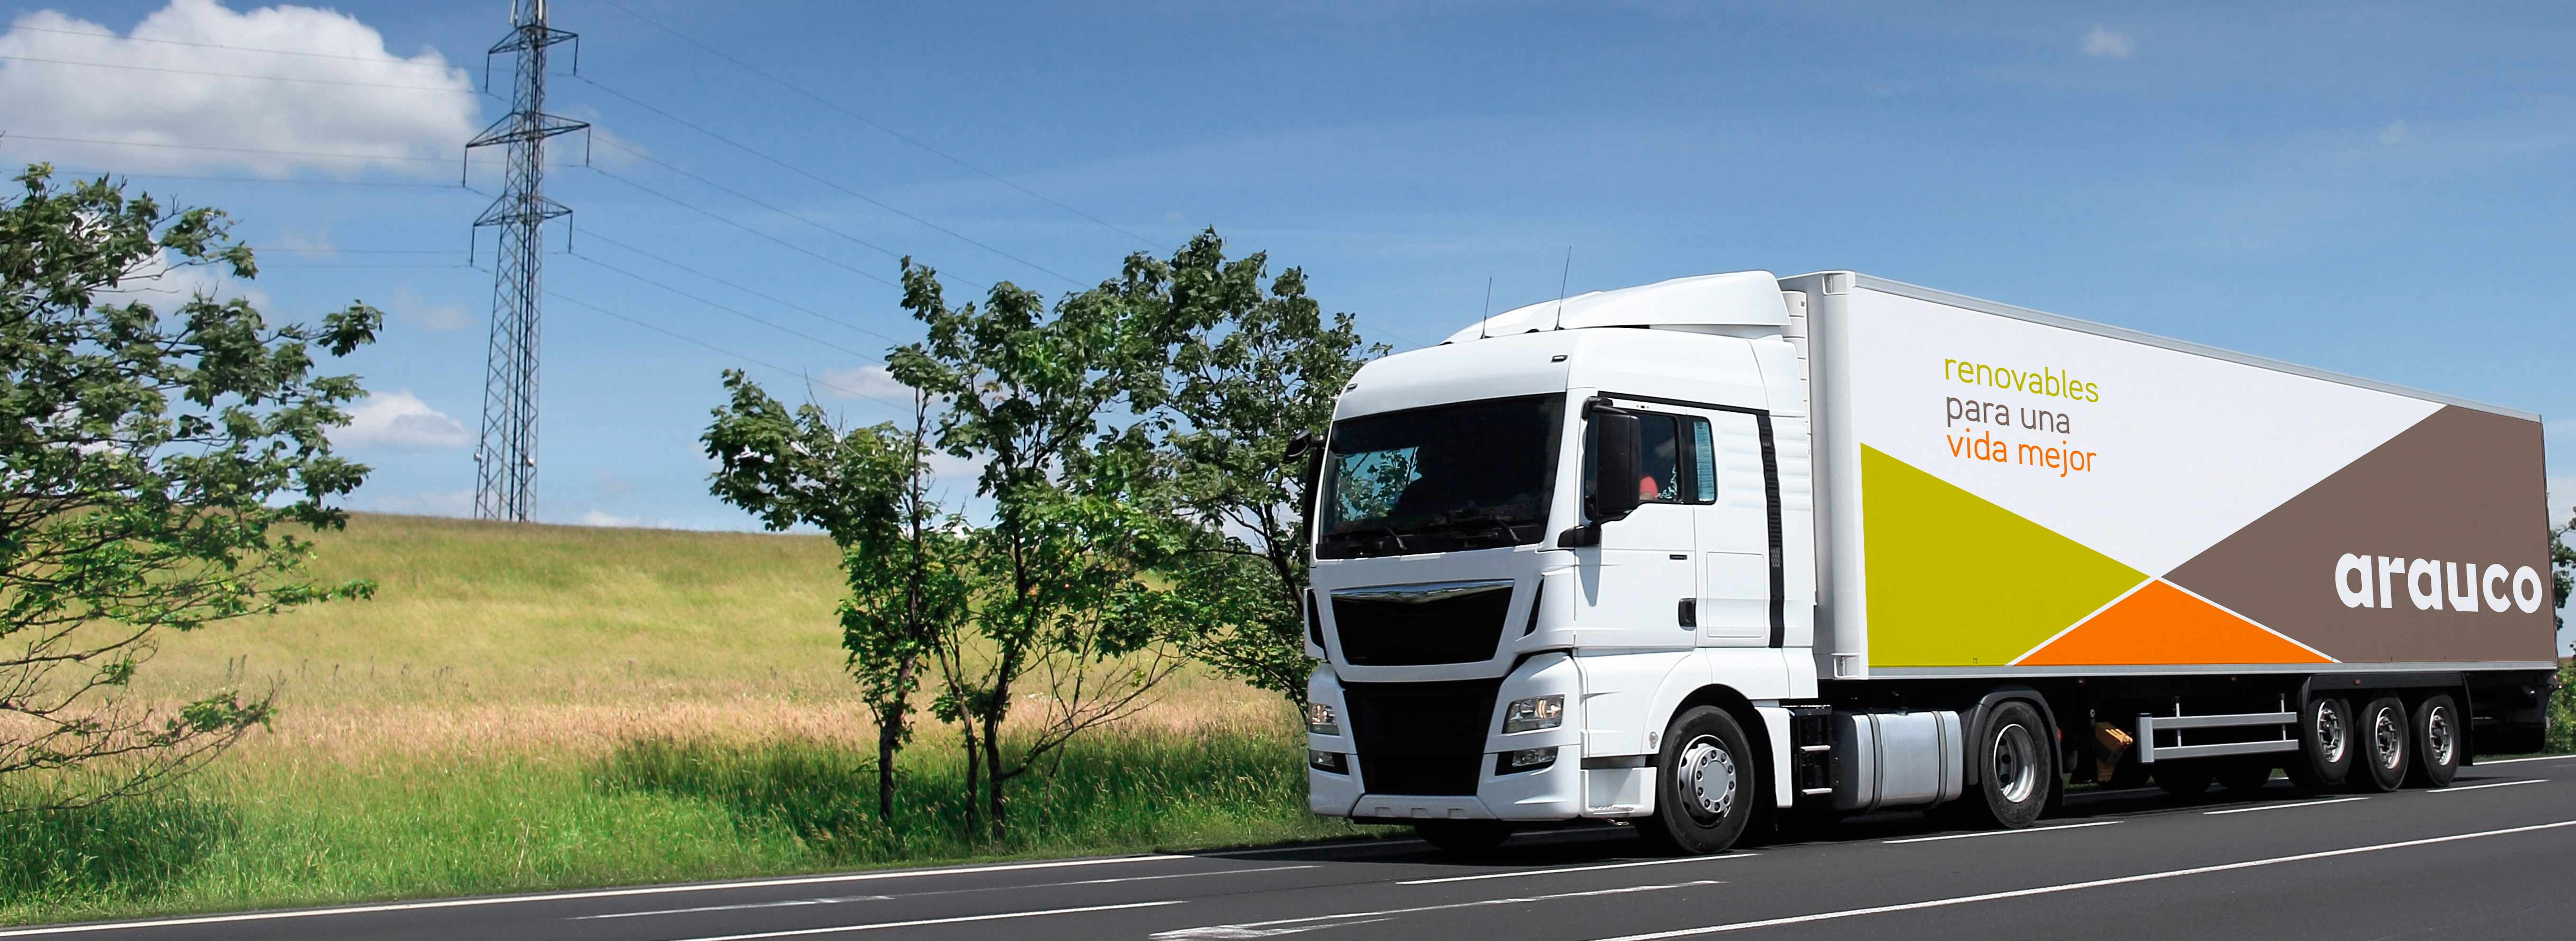 camion-corporativo2